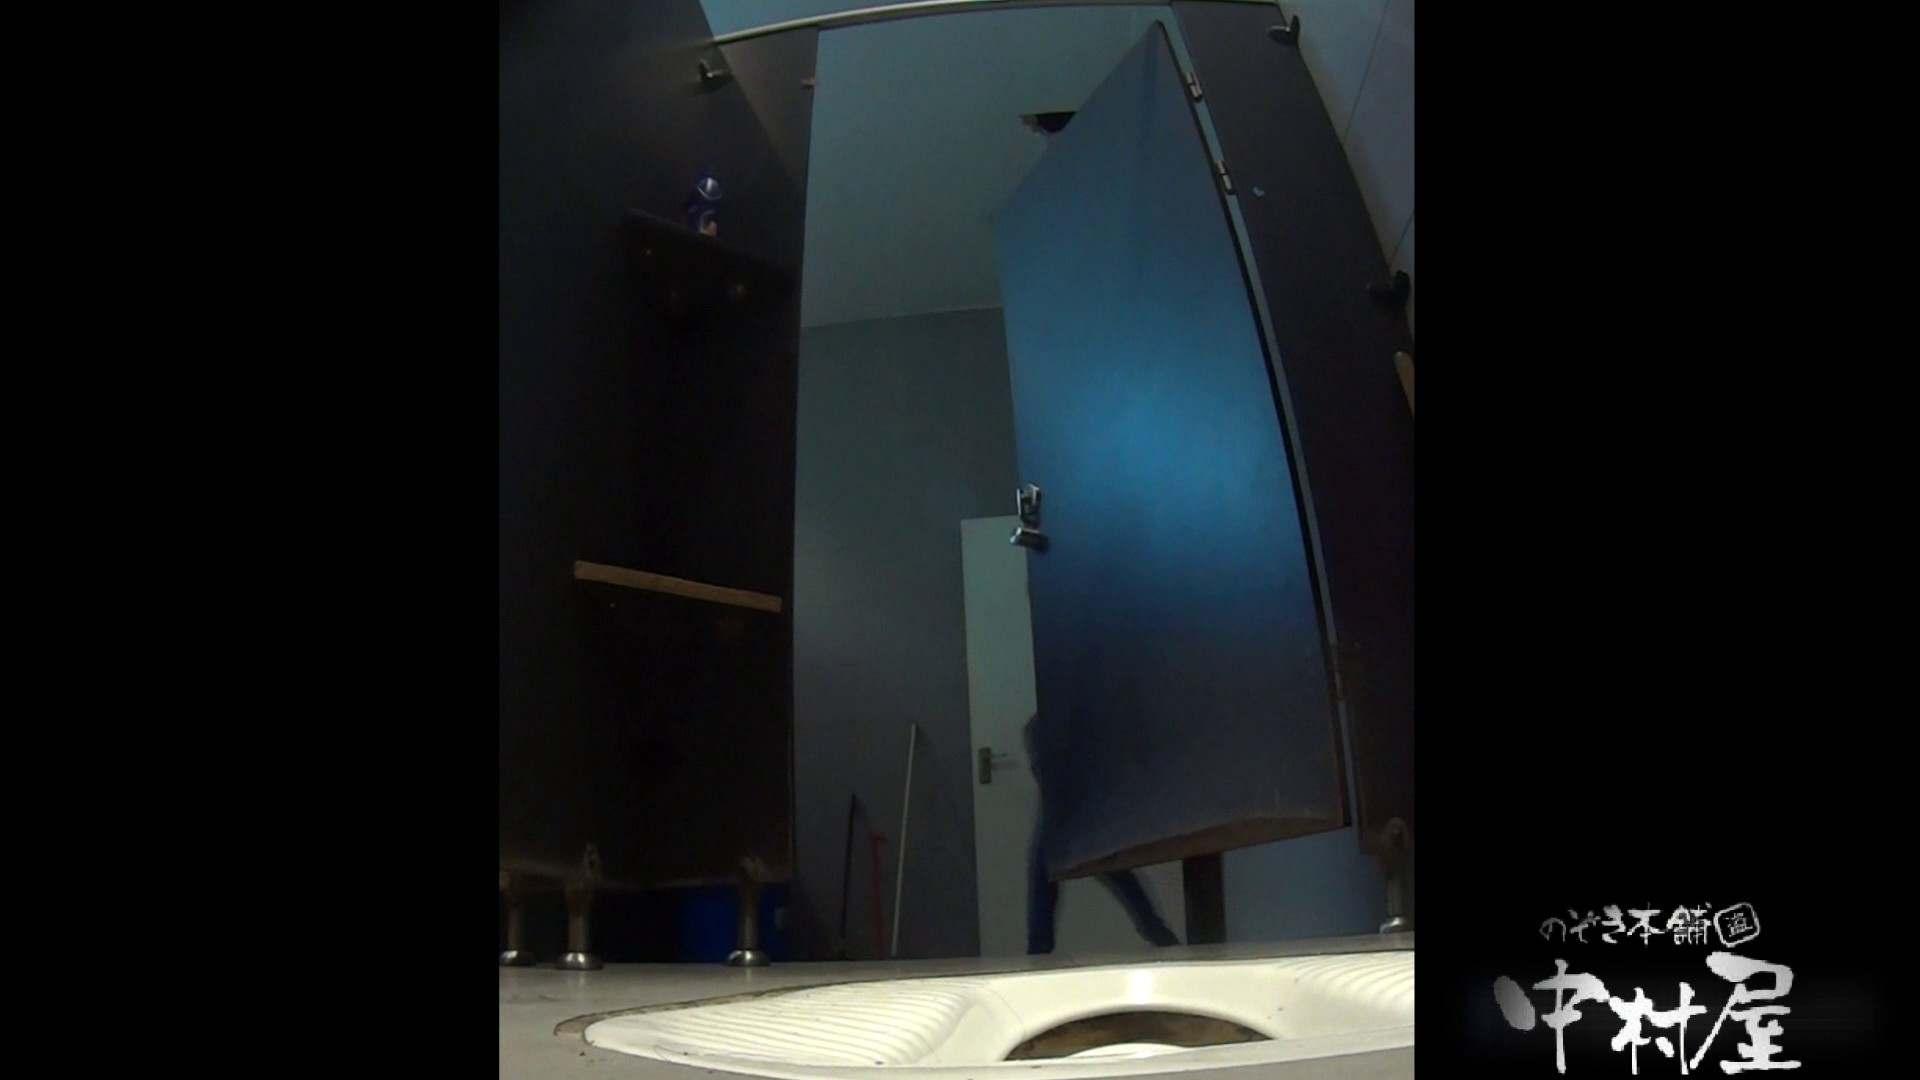 大学休憩時間の洗面所事情22 美女ハメ撮り  81Pix 73